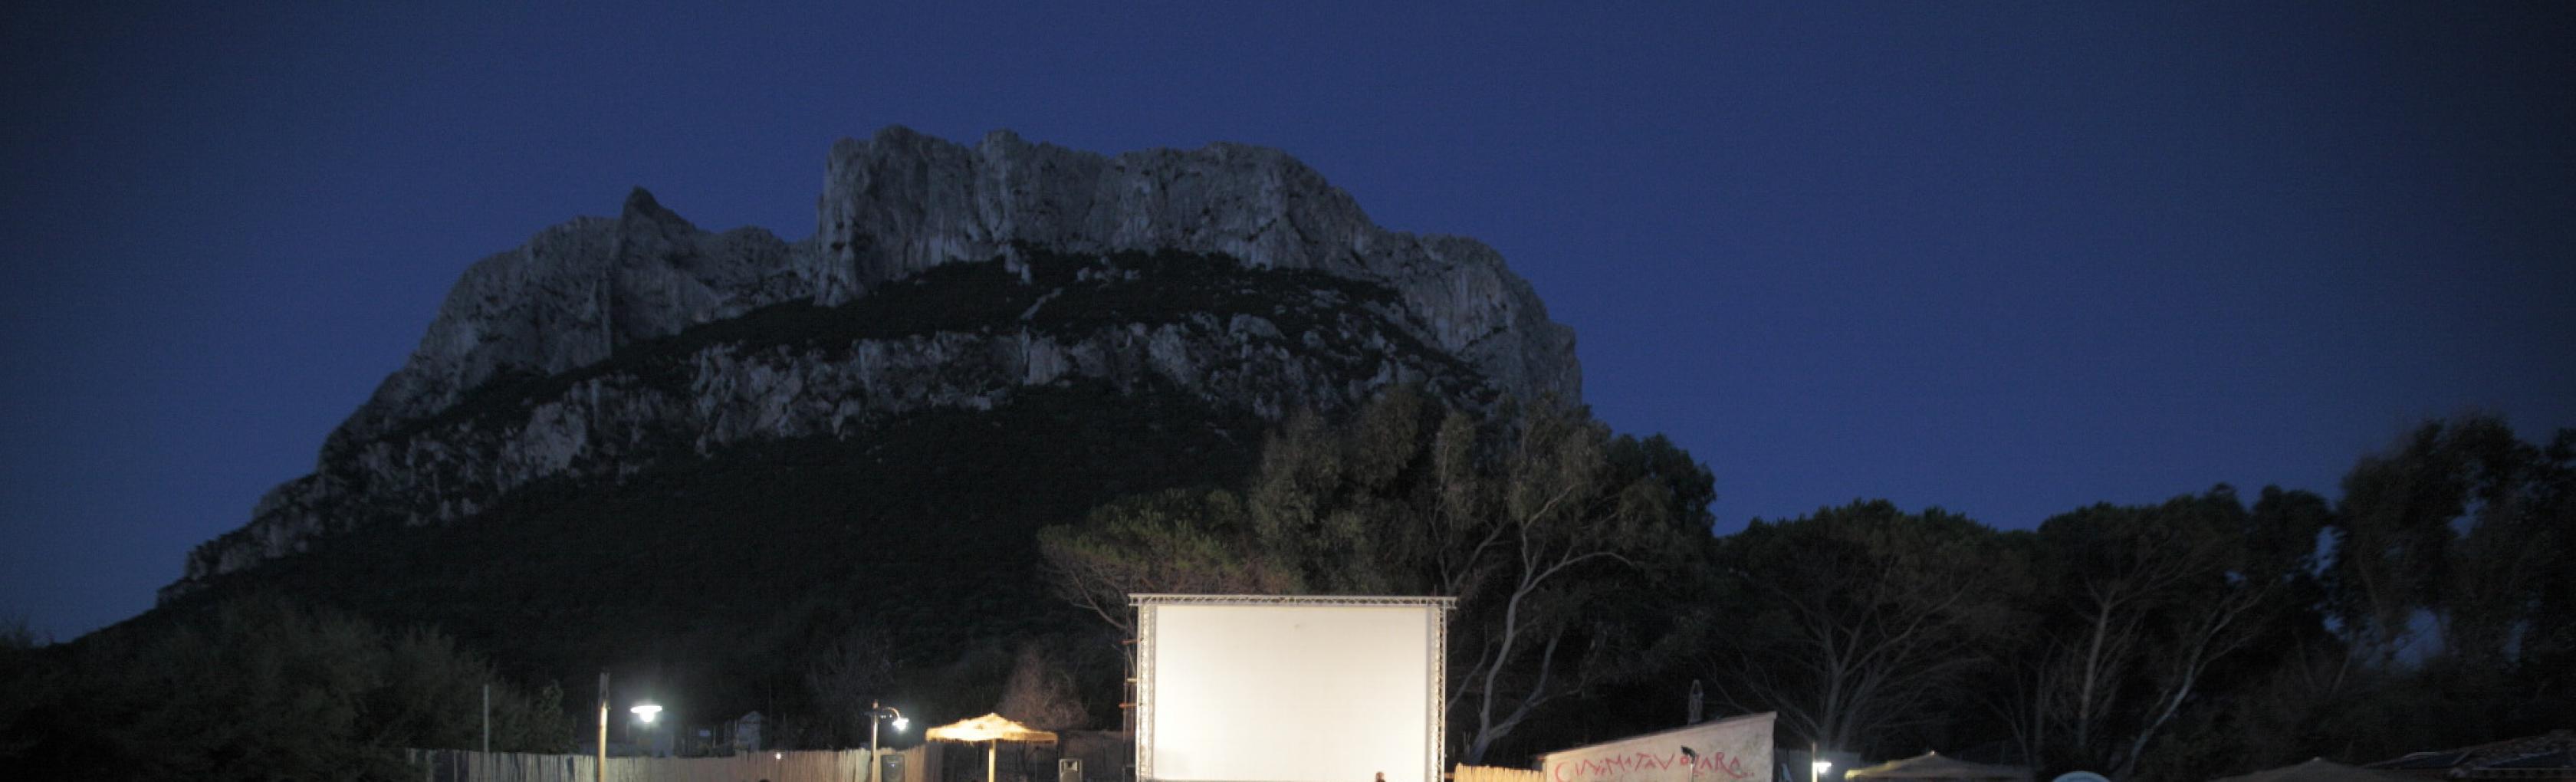 Una notte in Italia - Tavolara